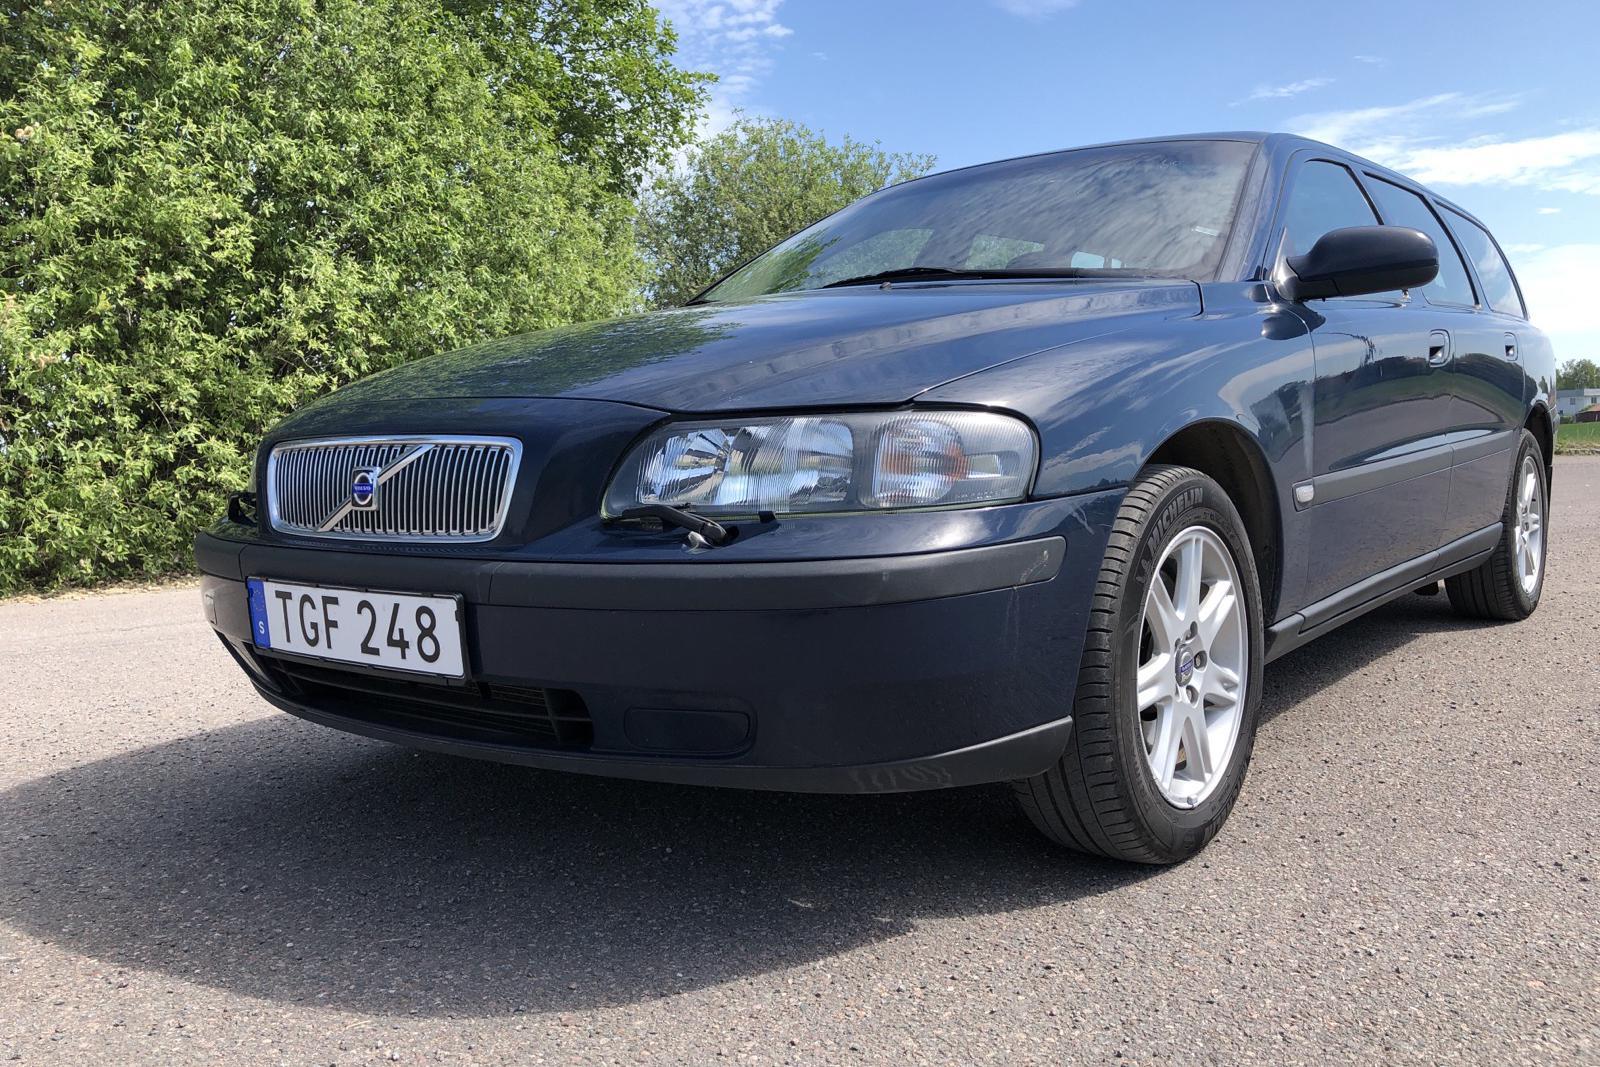 Volvo V70 2.4 (140hk) - 16 779 mil - Automat - Dark Blue - 2002